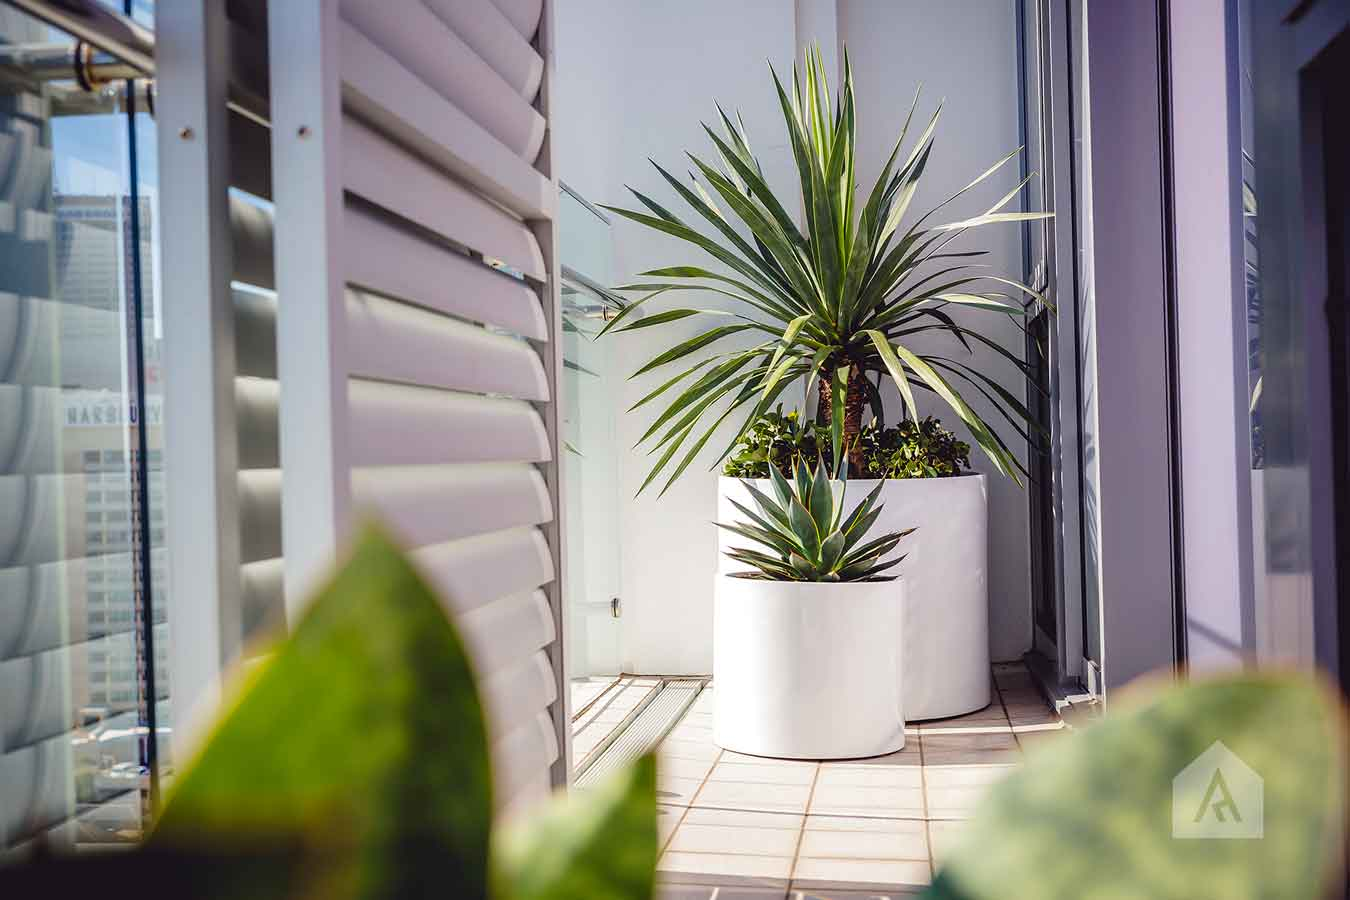 ©-Adam-Robinson-Design-Milson's-Point-Balcony-by-Chanelle-Ockenden-05.jpg